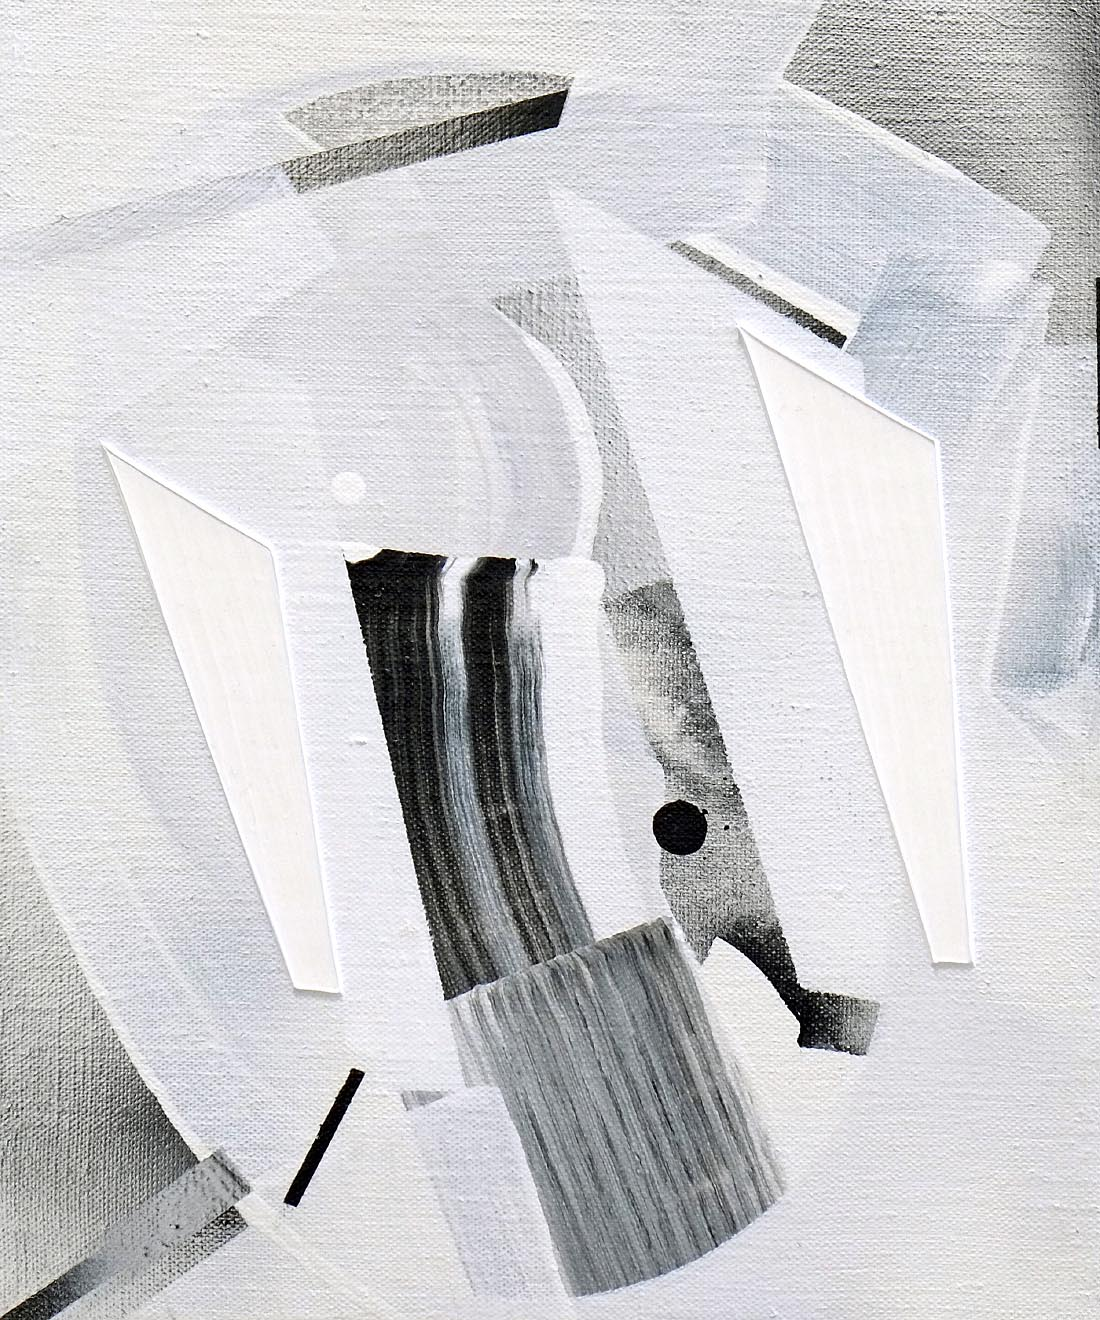 Arkab Prior, 2015, acrylic on linen, 12 x 10 cm